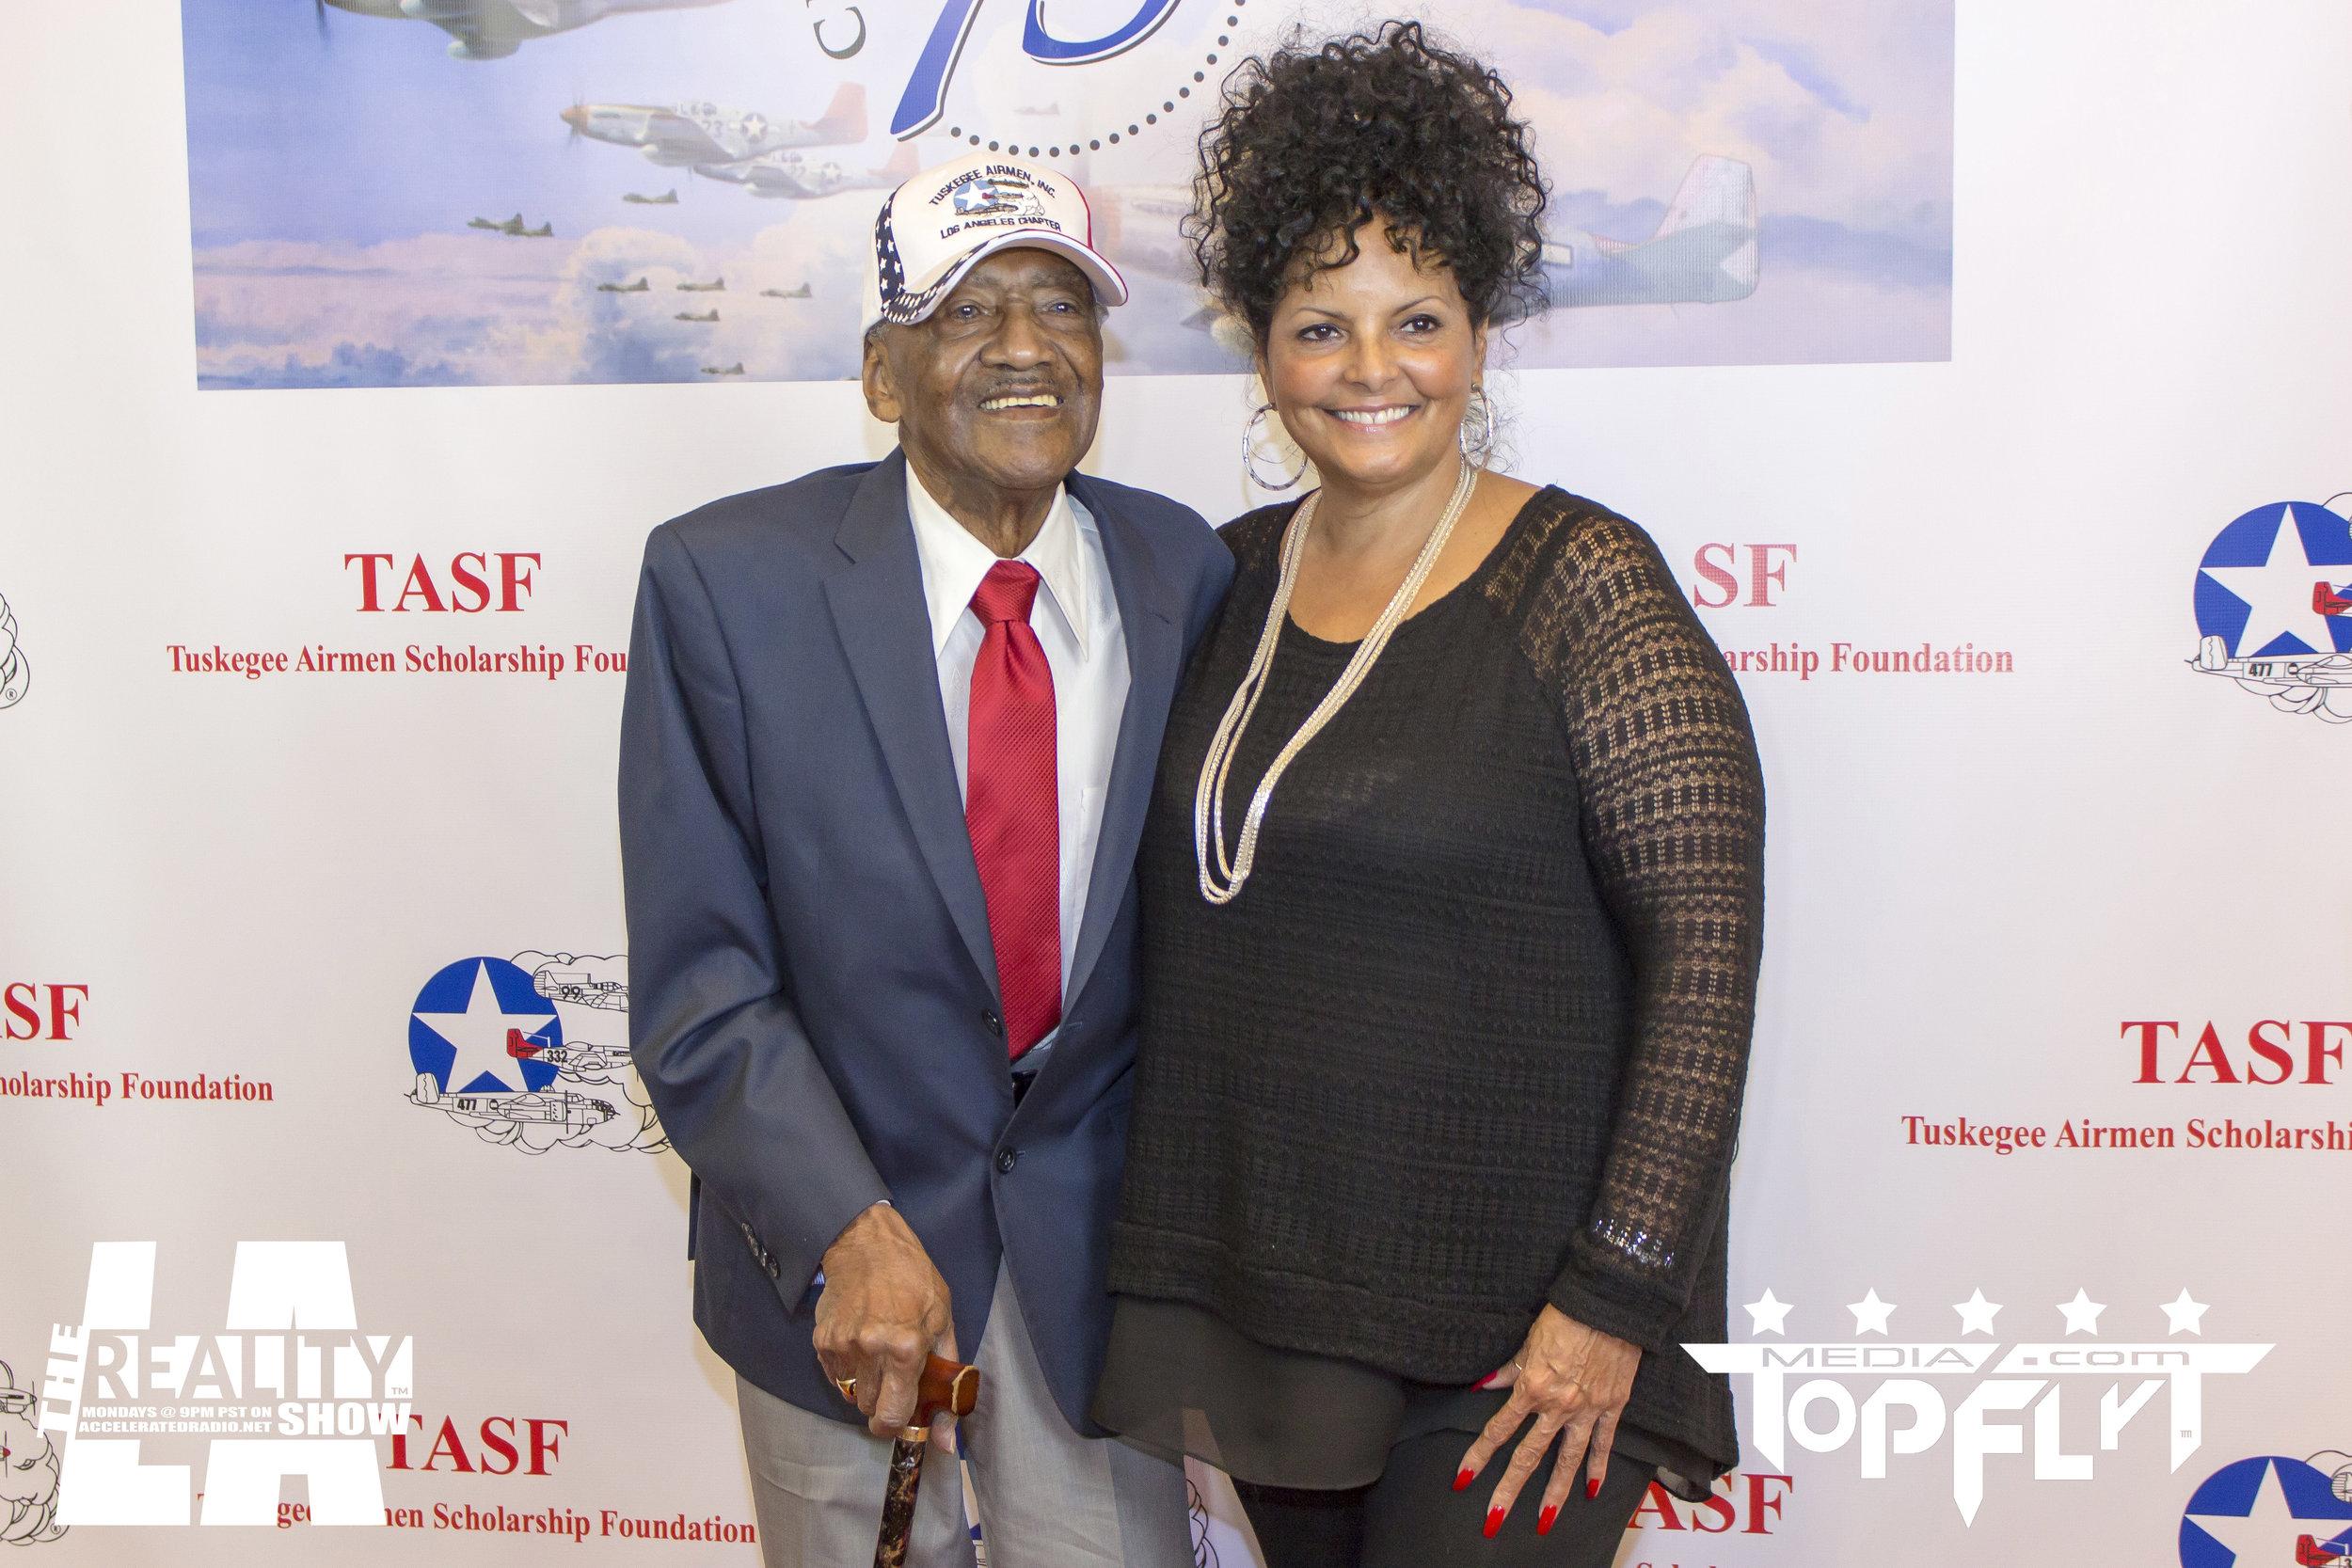 The Reality Show LA - Tuskegee Airmen 75th Anniversary VIP Reception_16.jpg